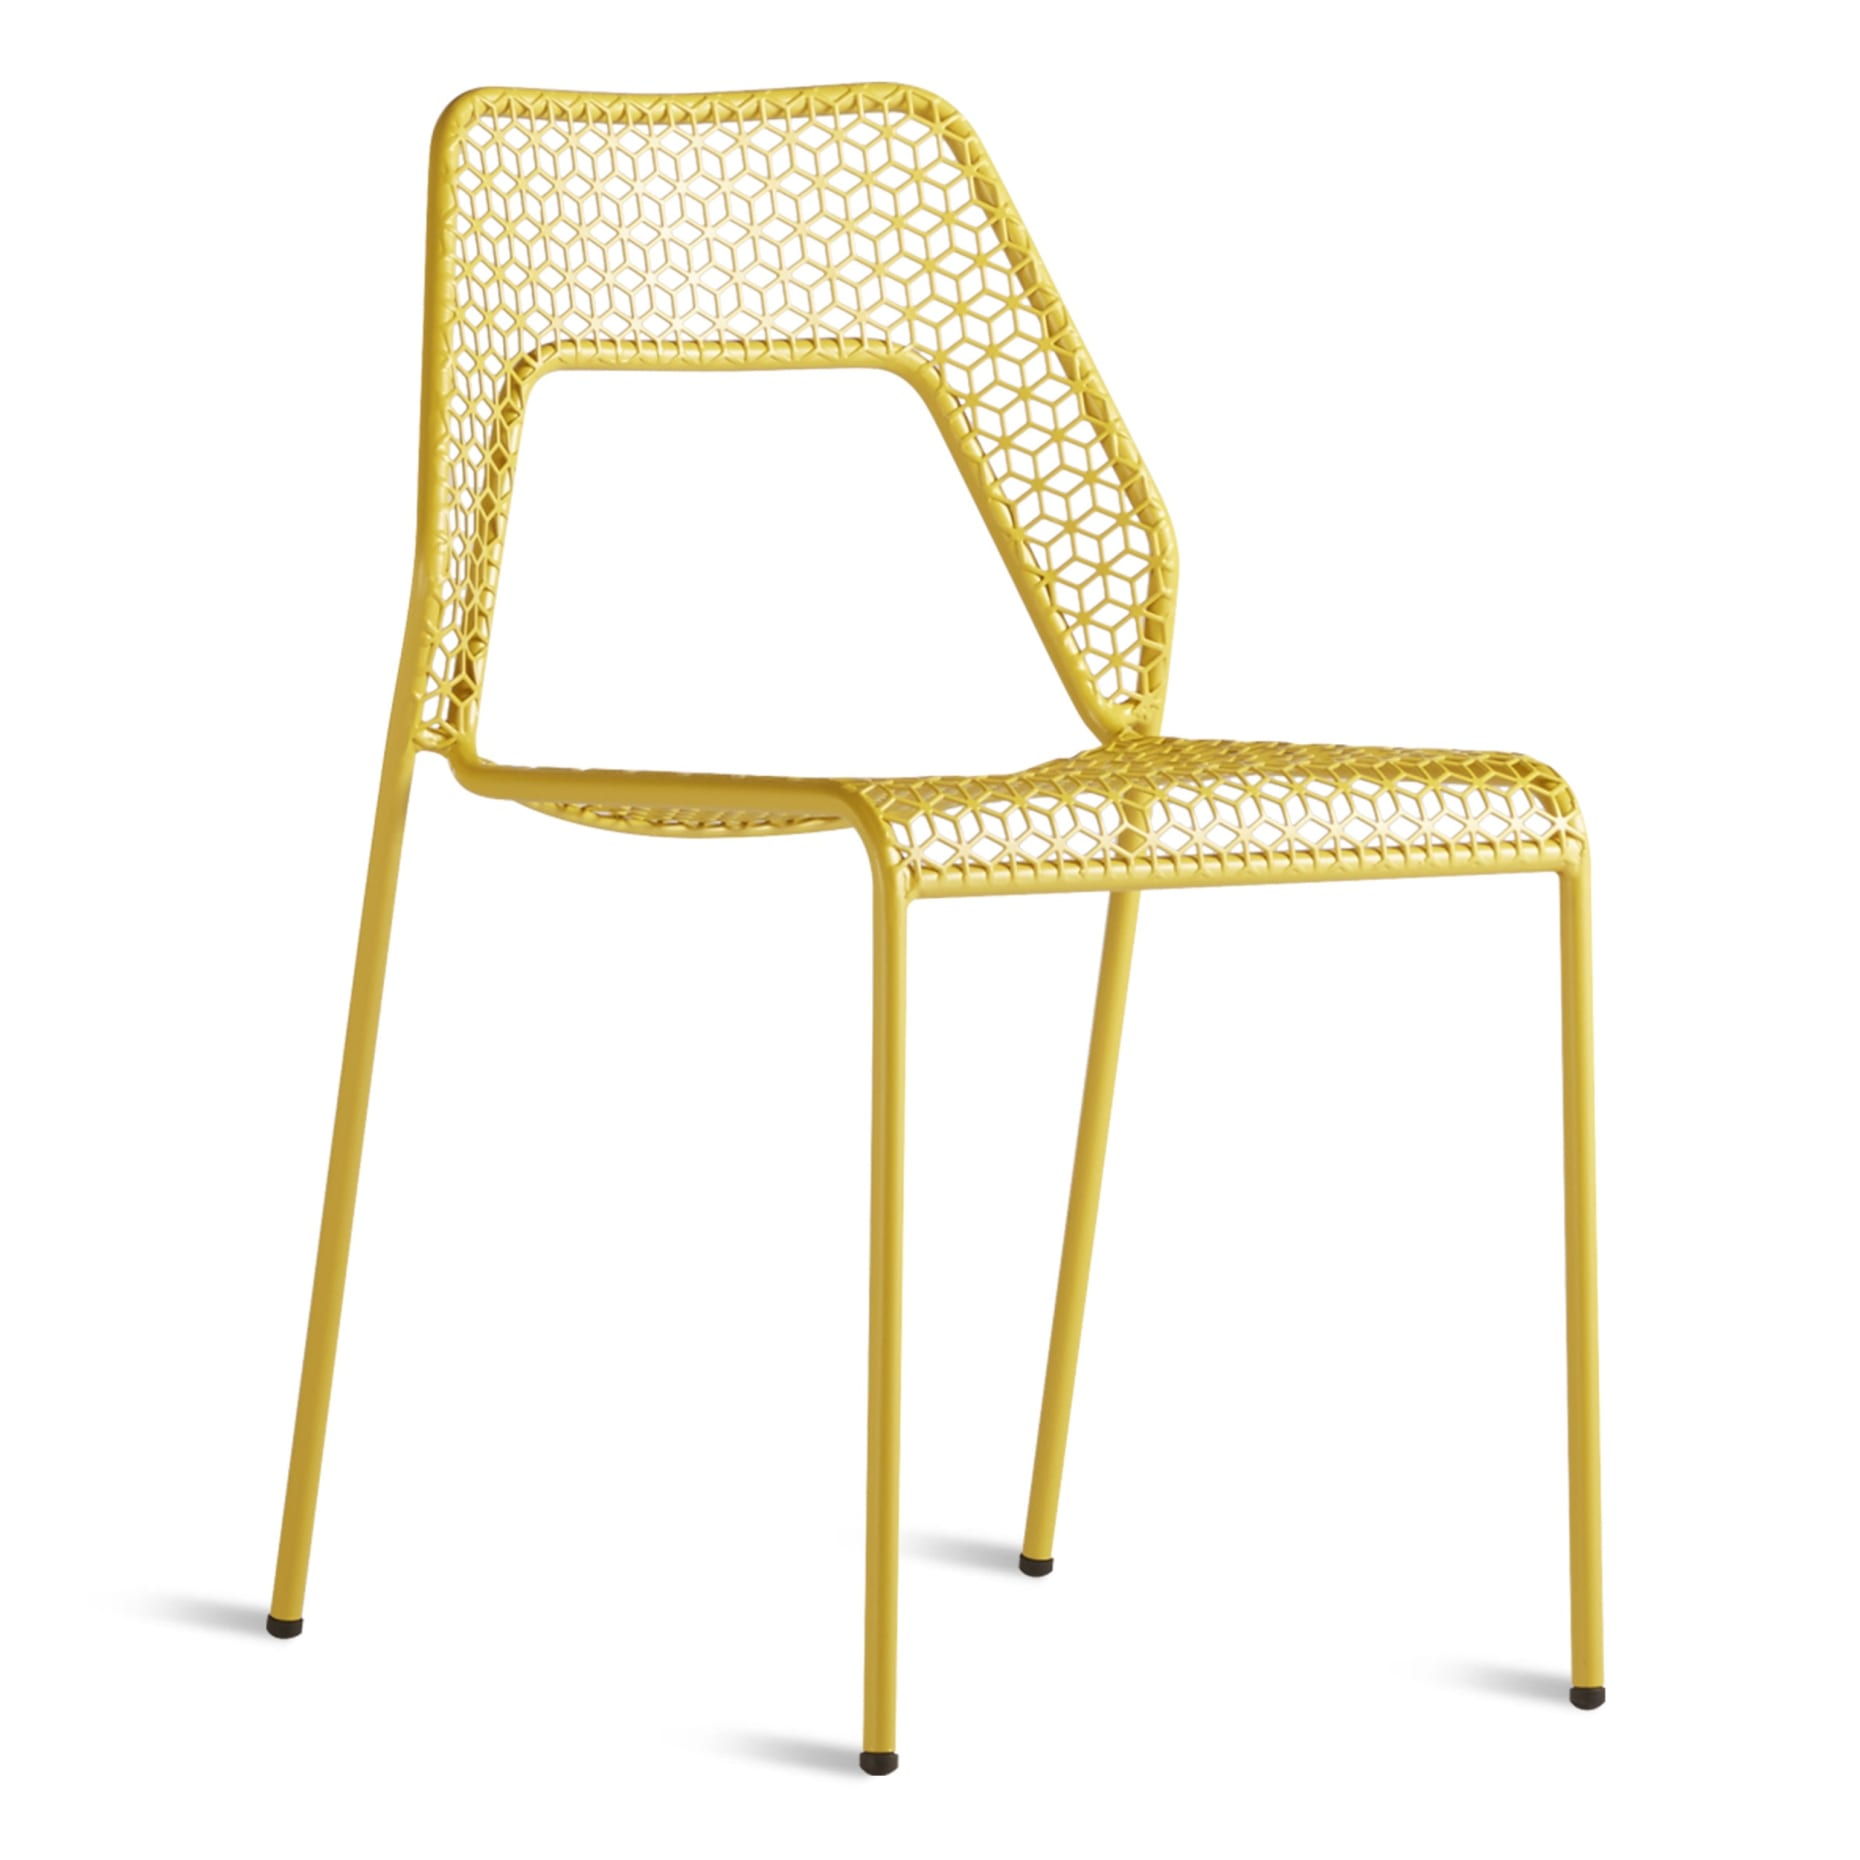 hm1-sidchr-yl-hot-mesh-chair-yellow_2_